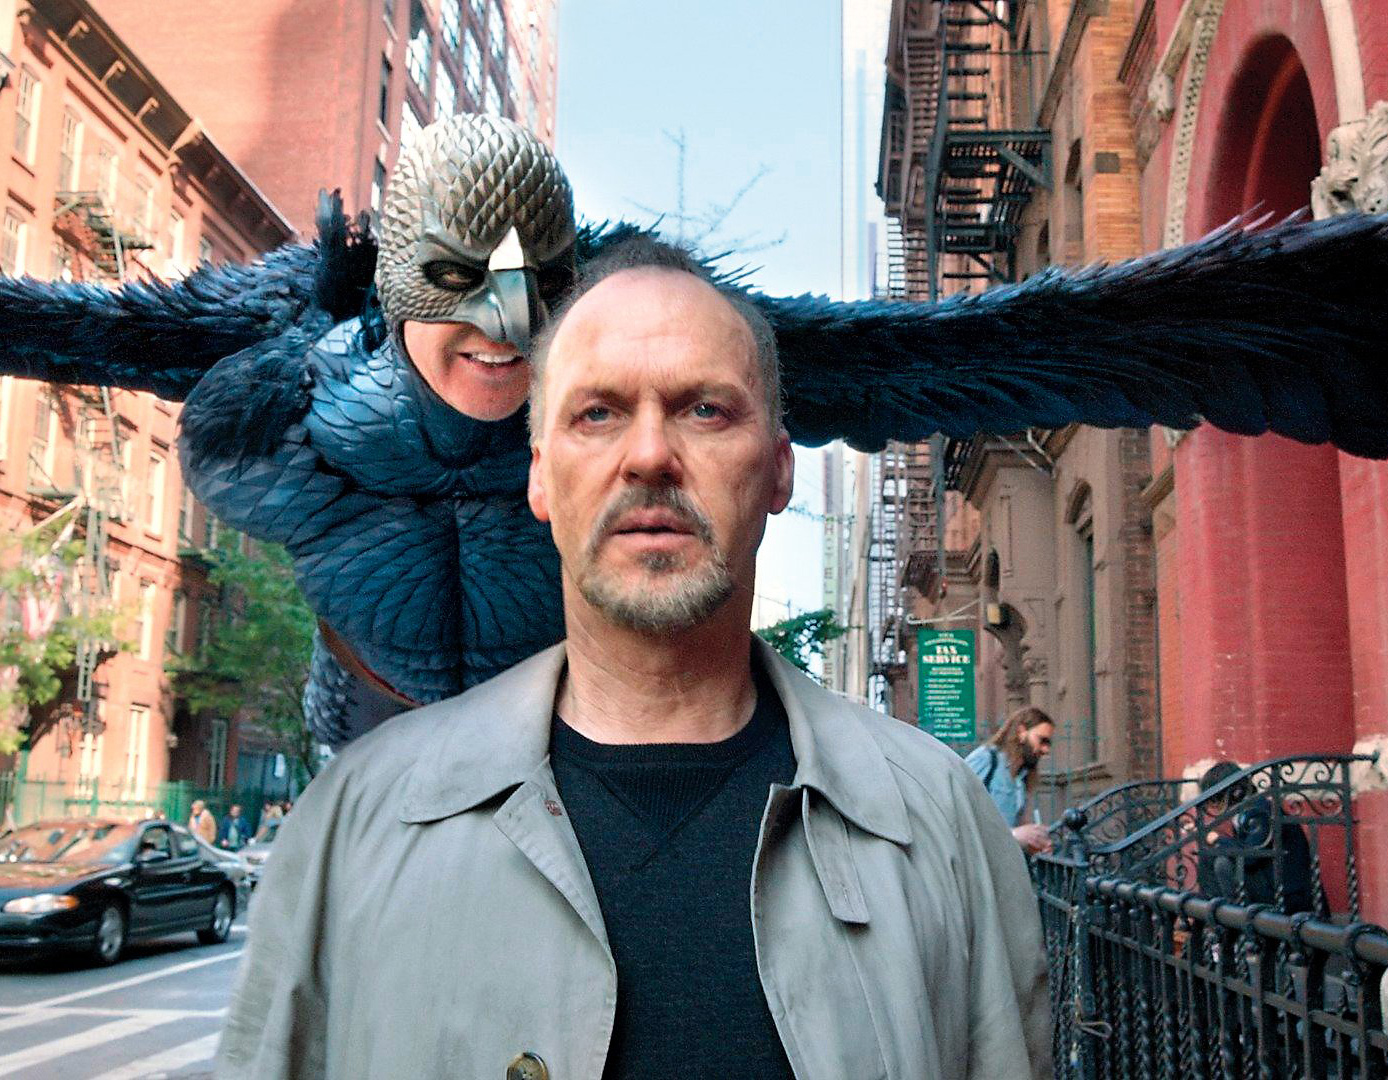 Birdman-Promotional-Still-birdman-2014-37694388-1998-1080